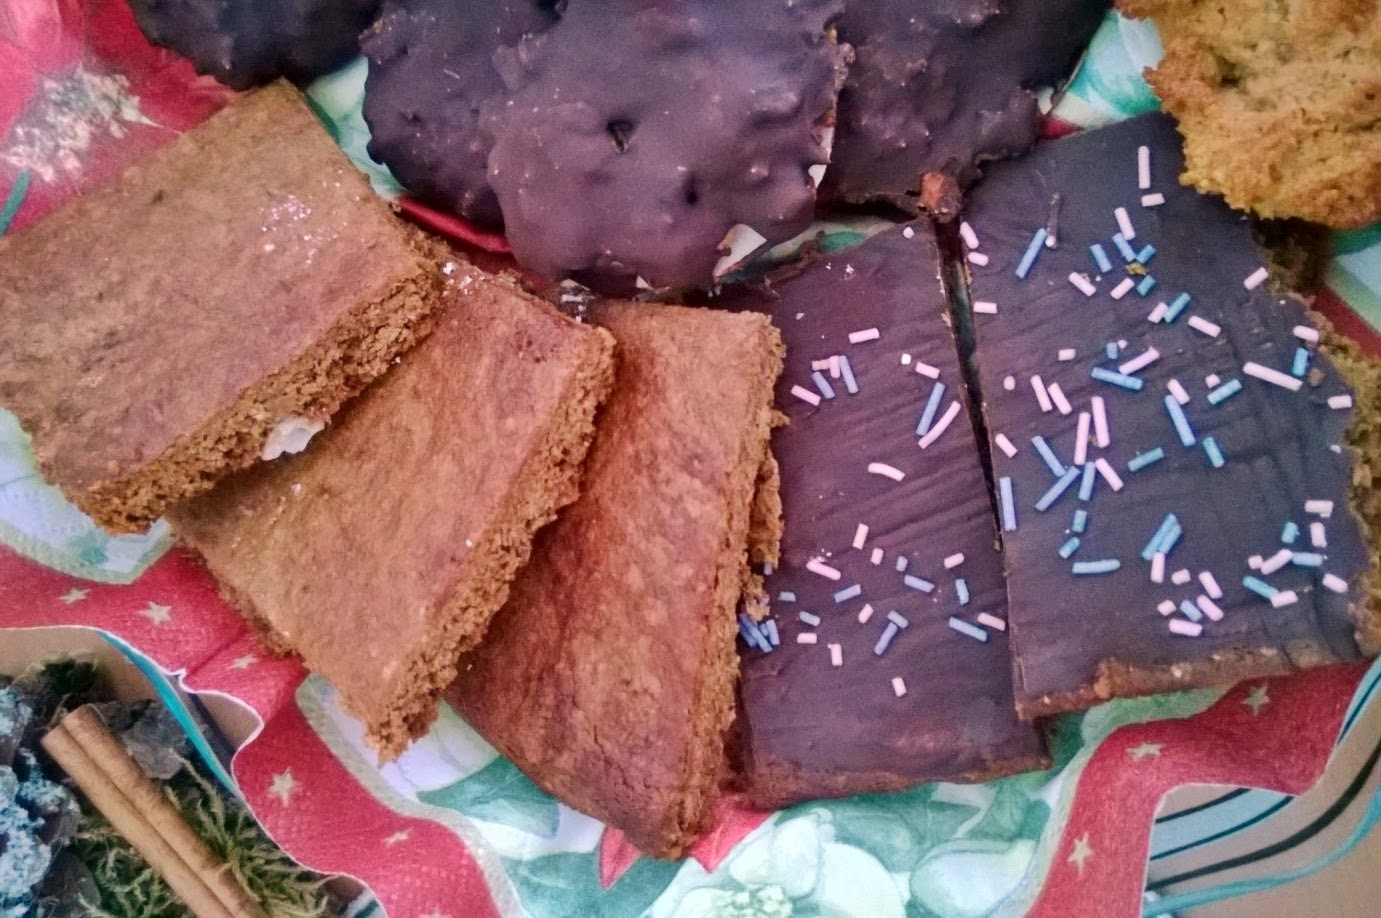 Food Reports: [Vegan] Braune Kuchen/Lebkuchen